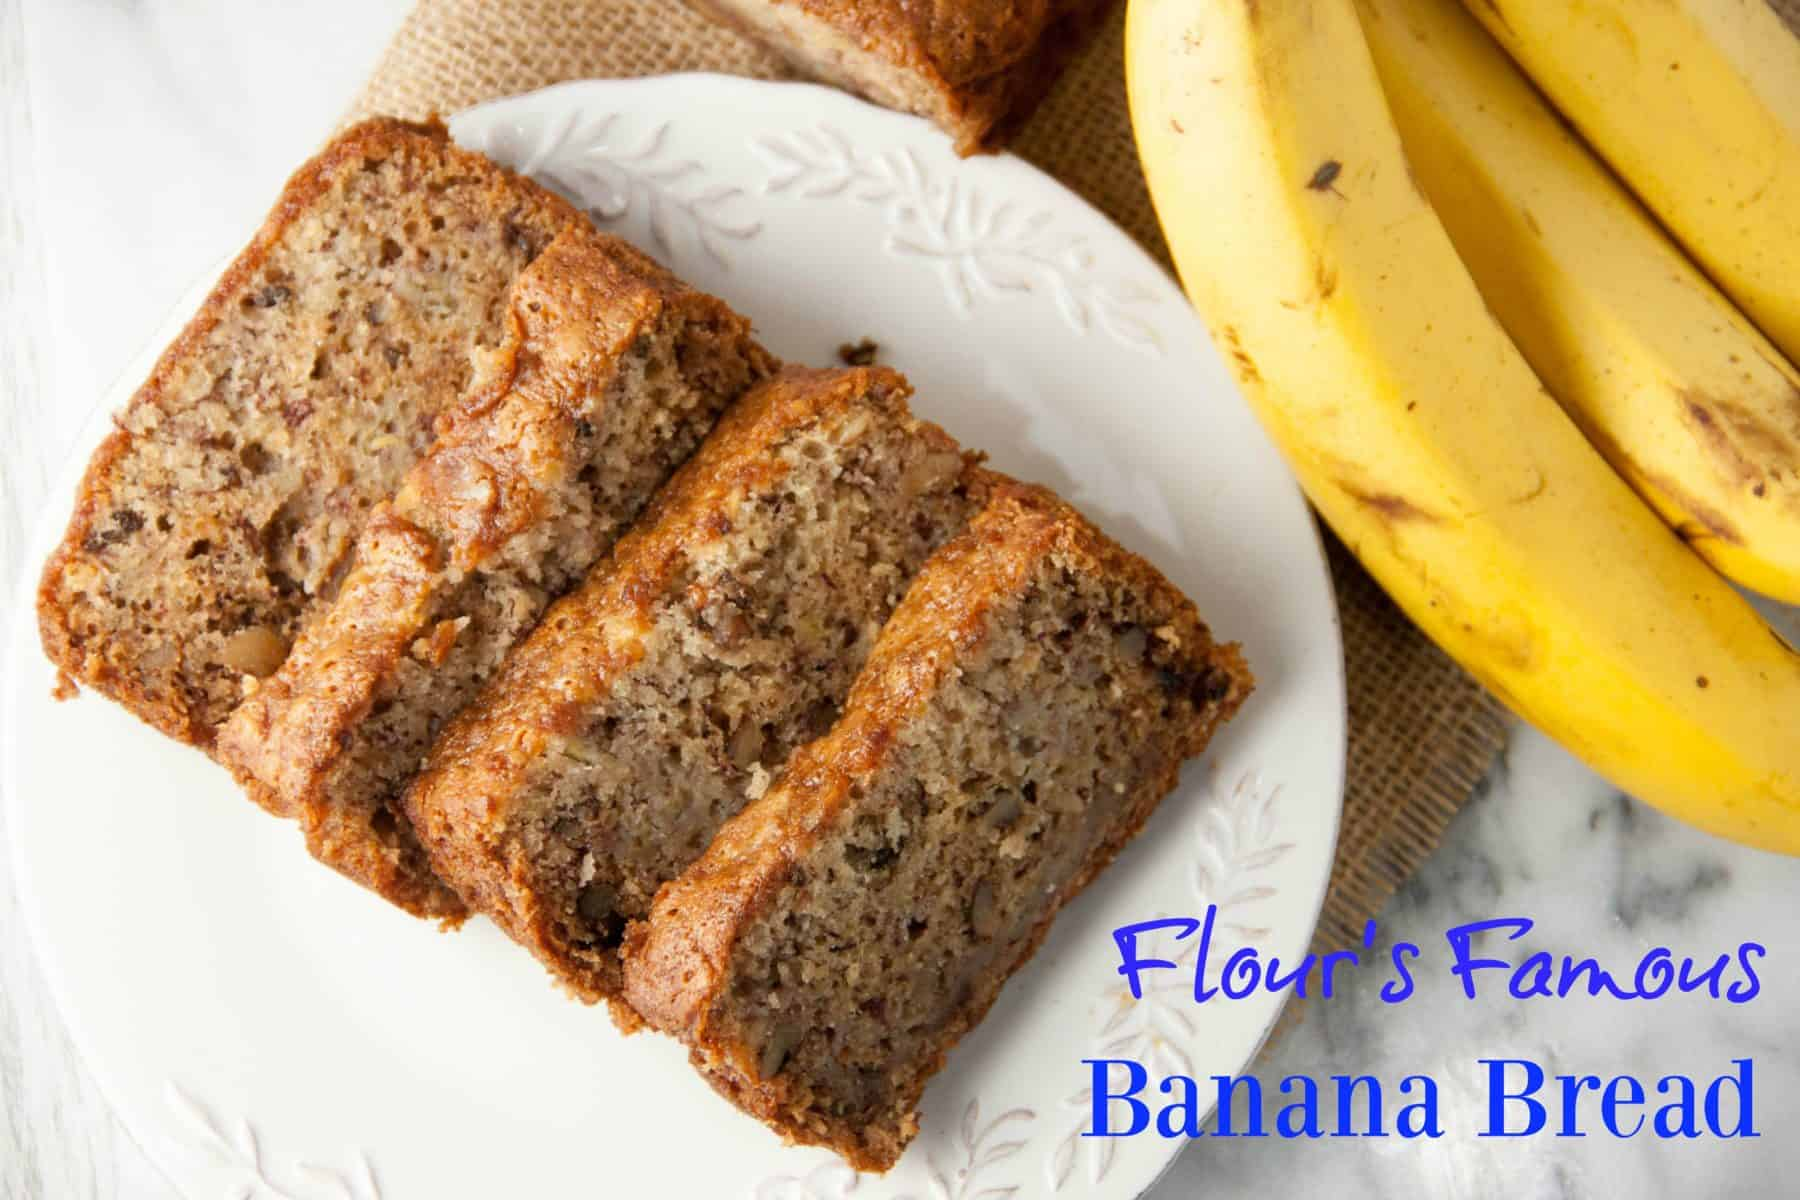 Flour Bakery's Famous Banana Bread